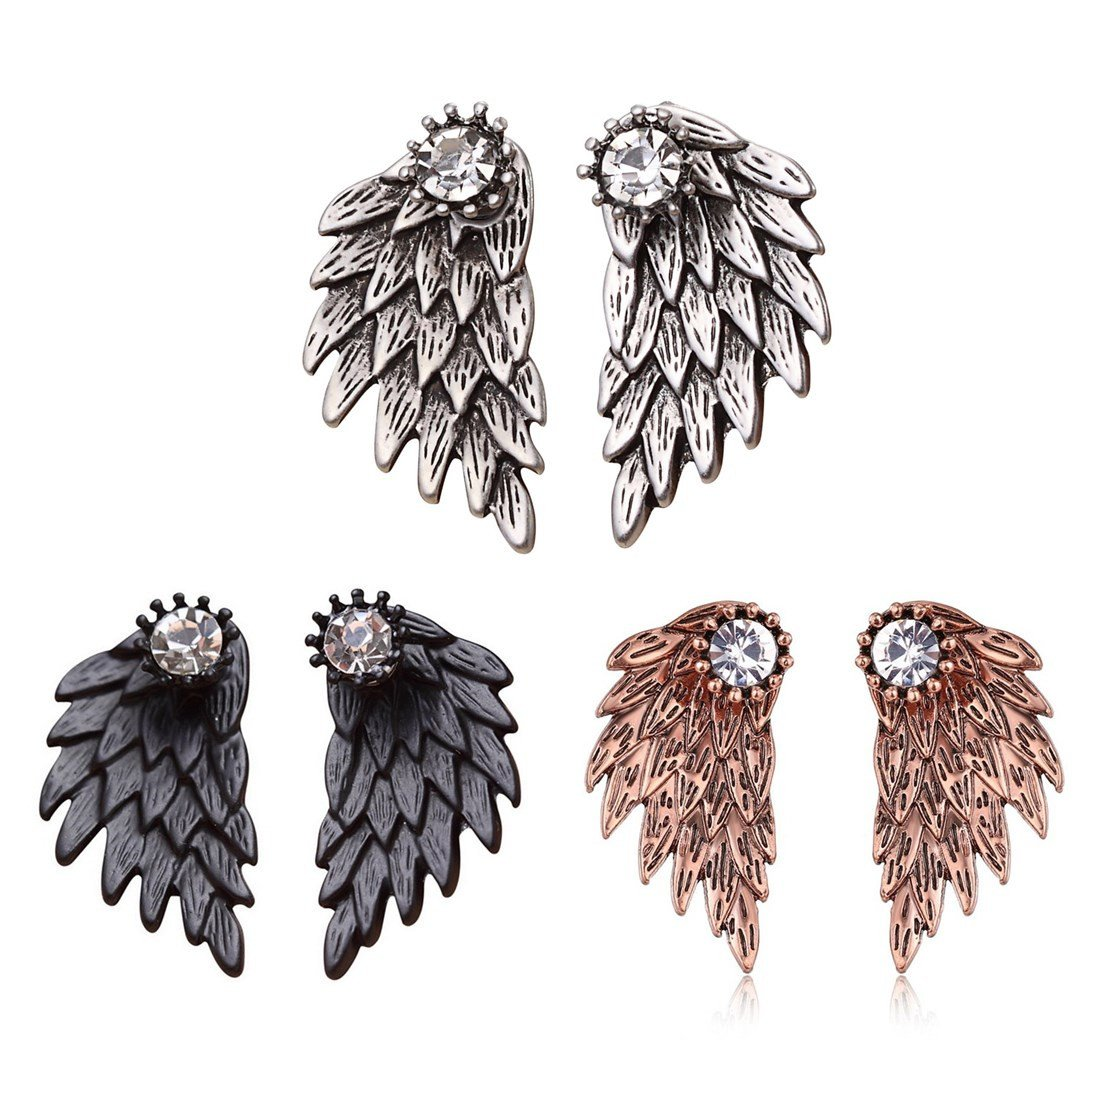 Cute Gothic Angel Wing Stud Earrings Ear Jacket for Women Unique Fashion MengPa Jewelry (Antique Silver+Black+Copper)